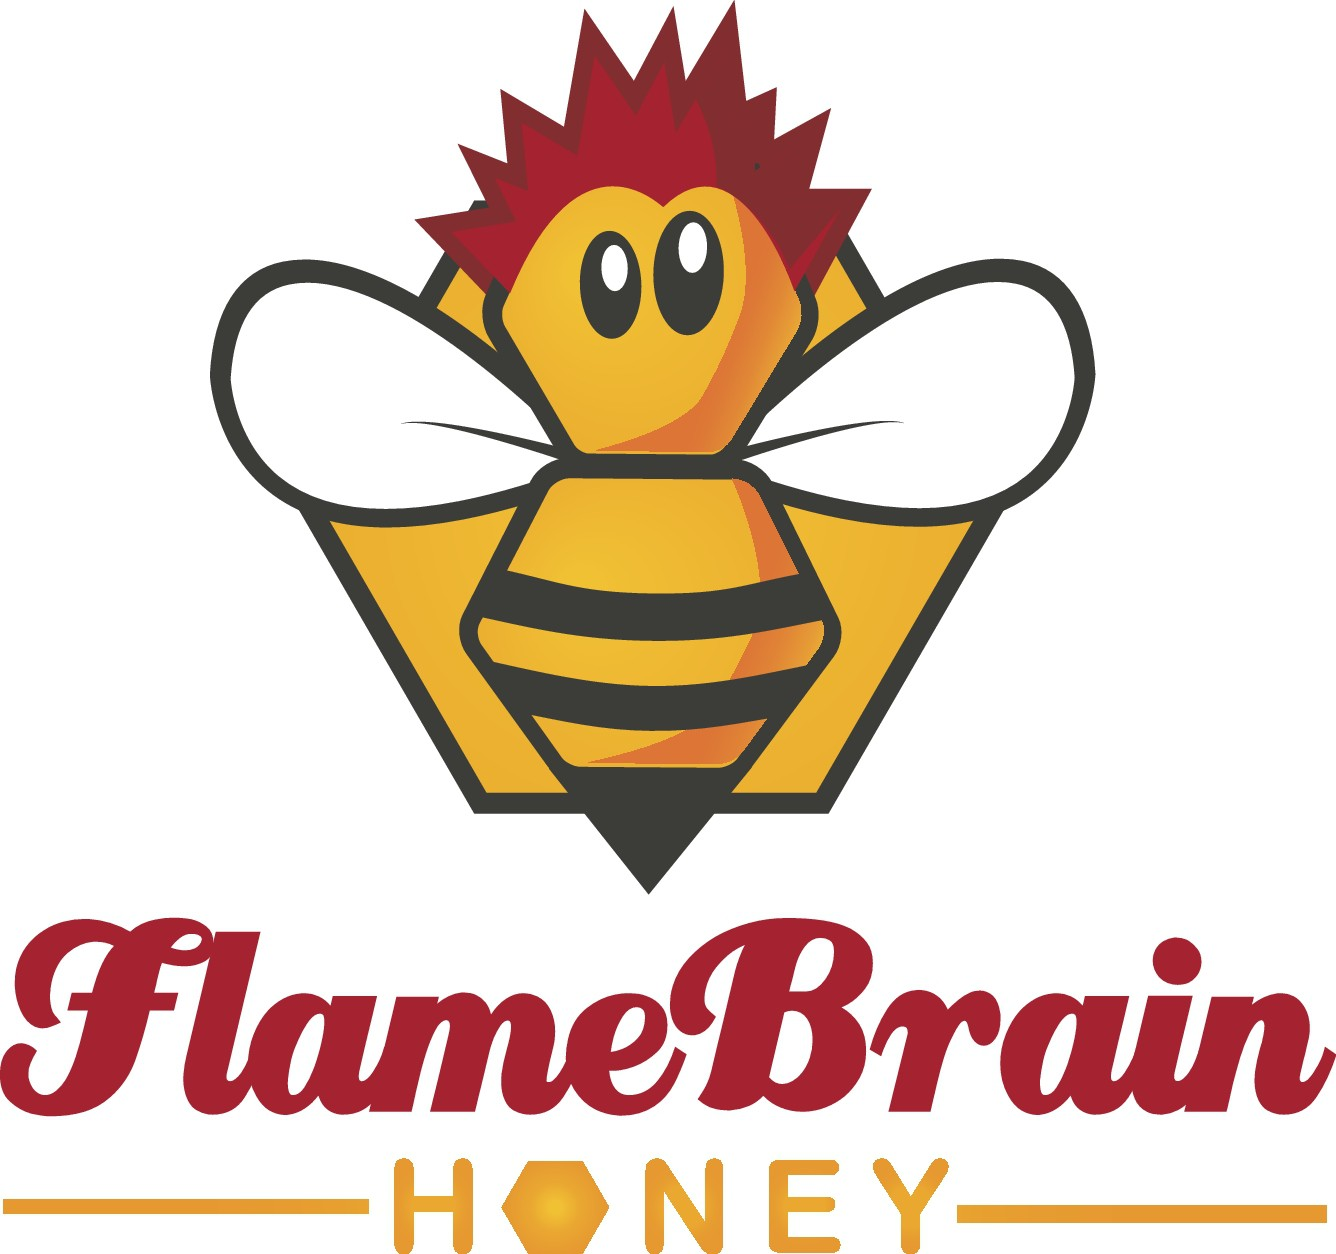 Flame Brain Honey